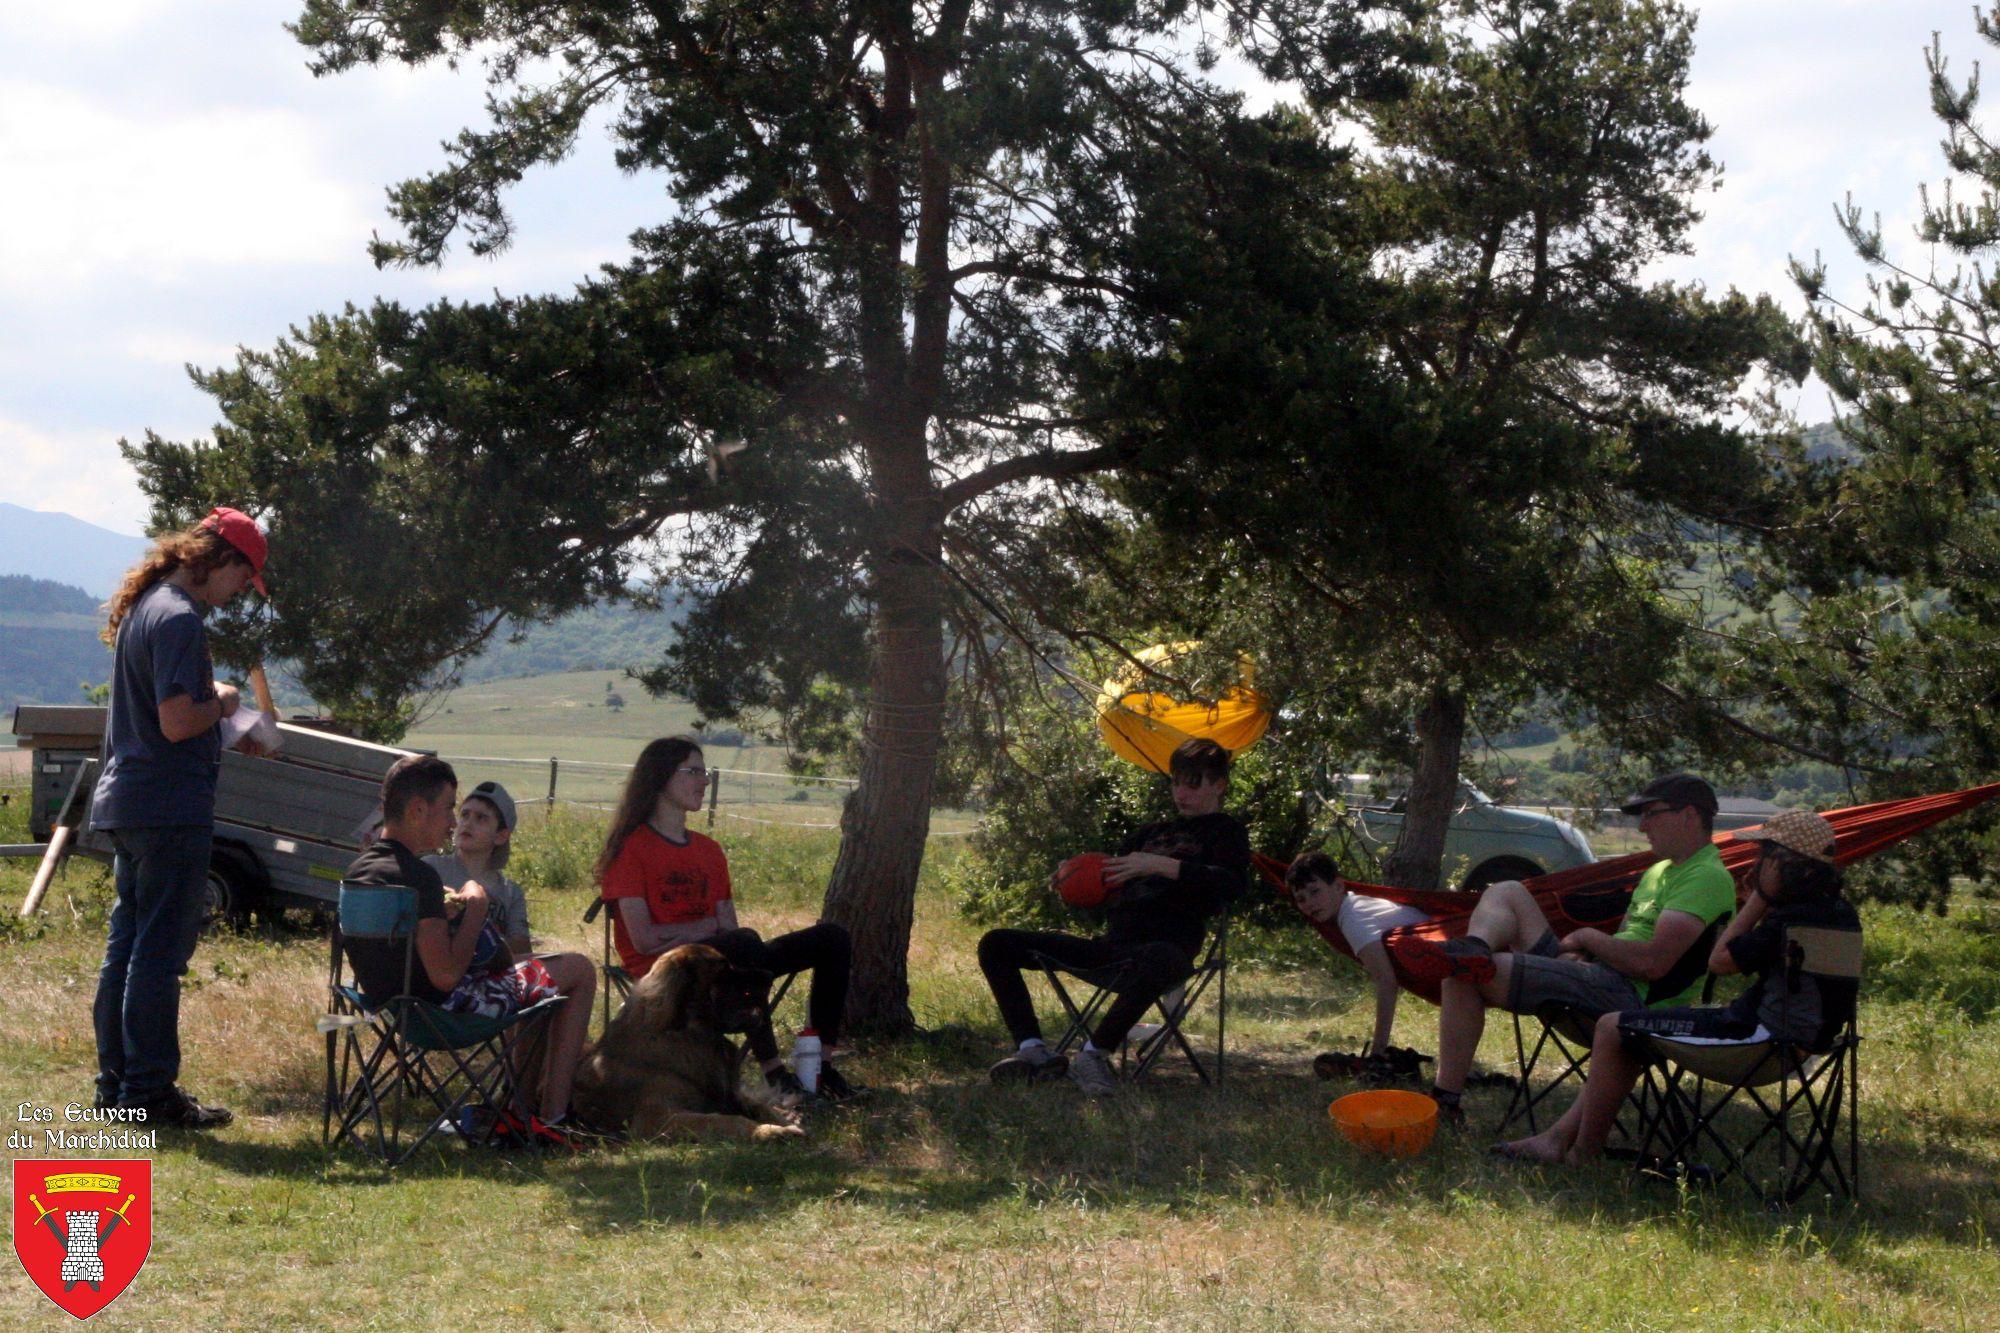 2020-06-01_Camping_Gourdon-21-www.marchidial.fr_